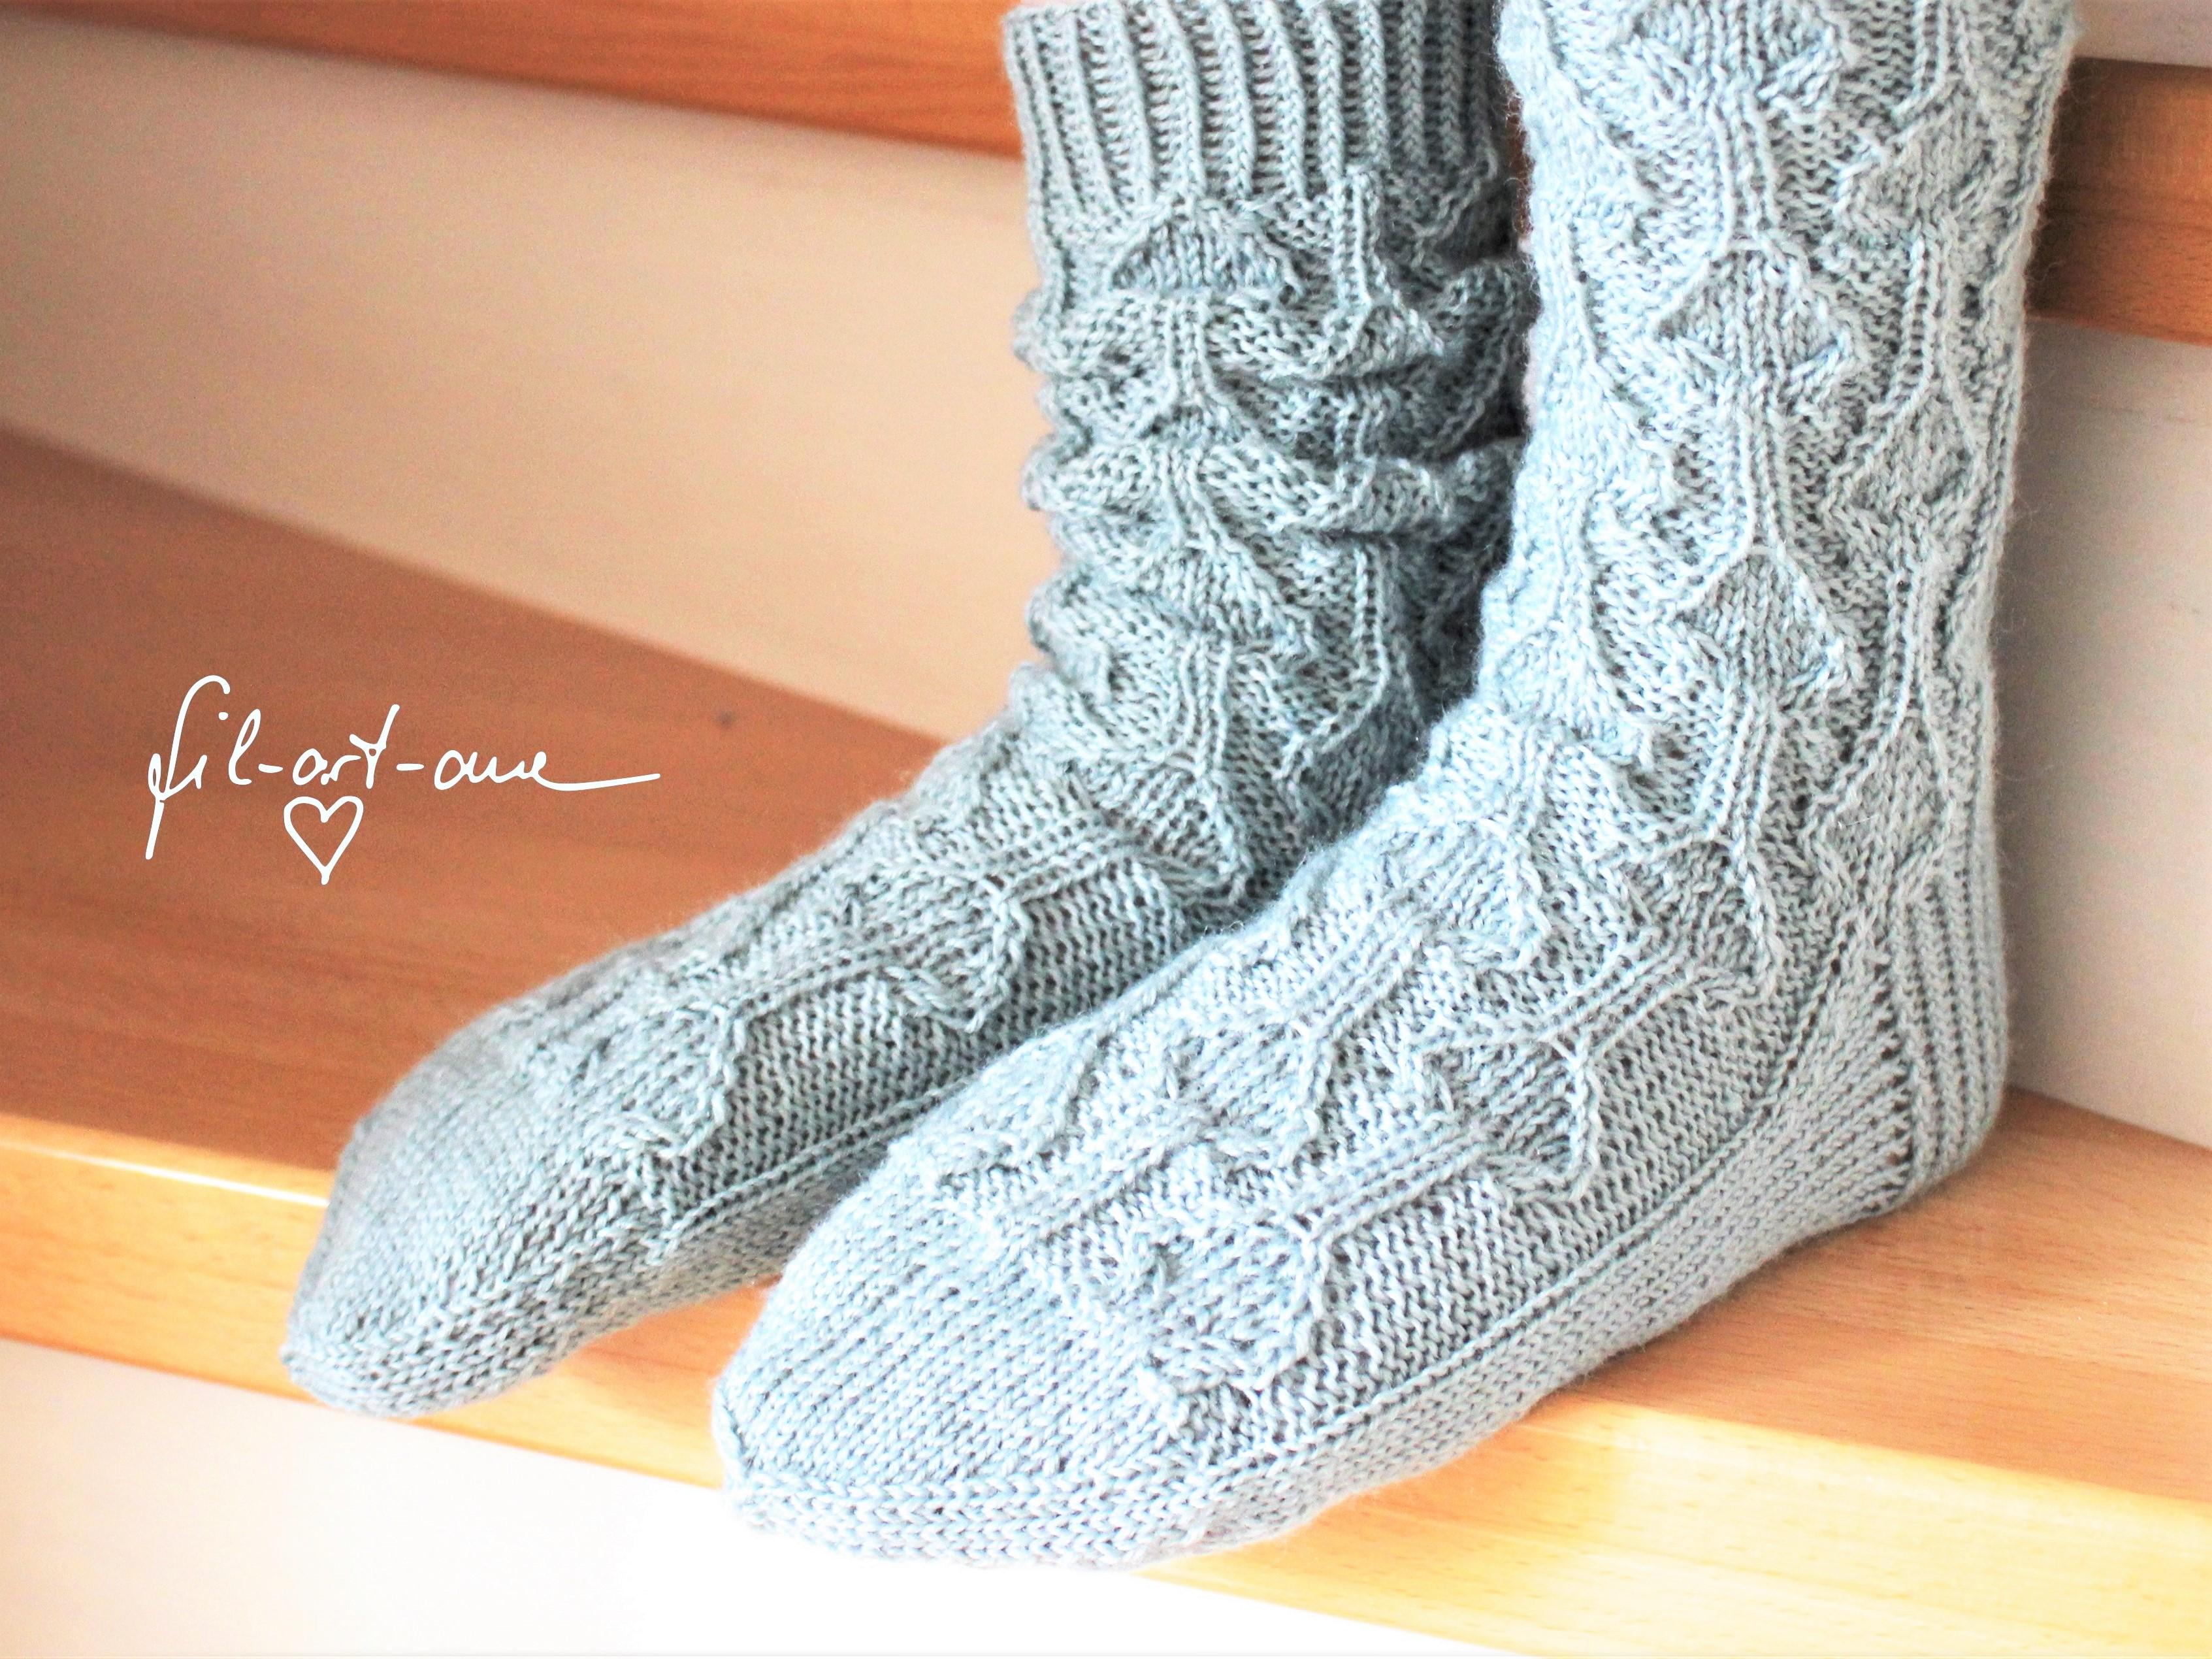 Hausschuhe / Socken handarbeiten - Empfehlungen Forum